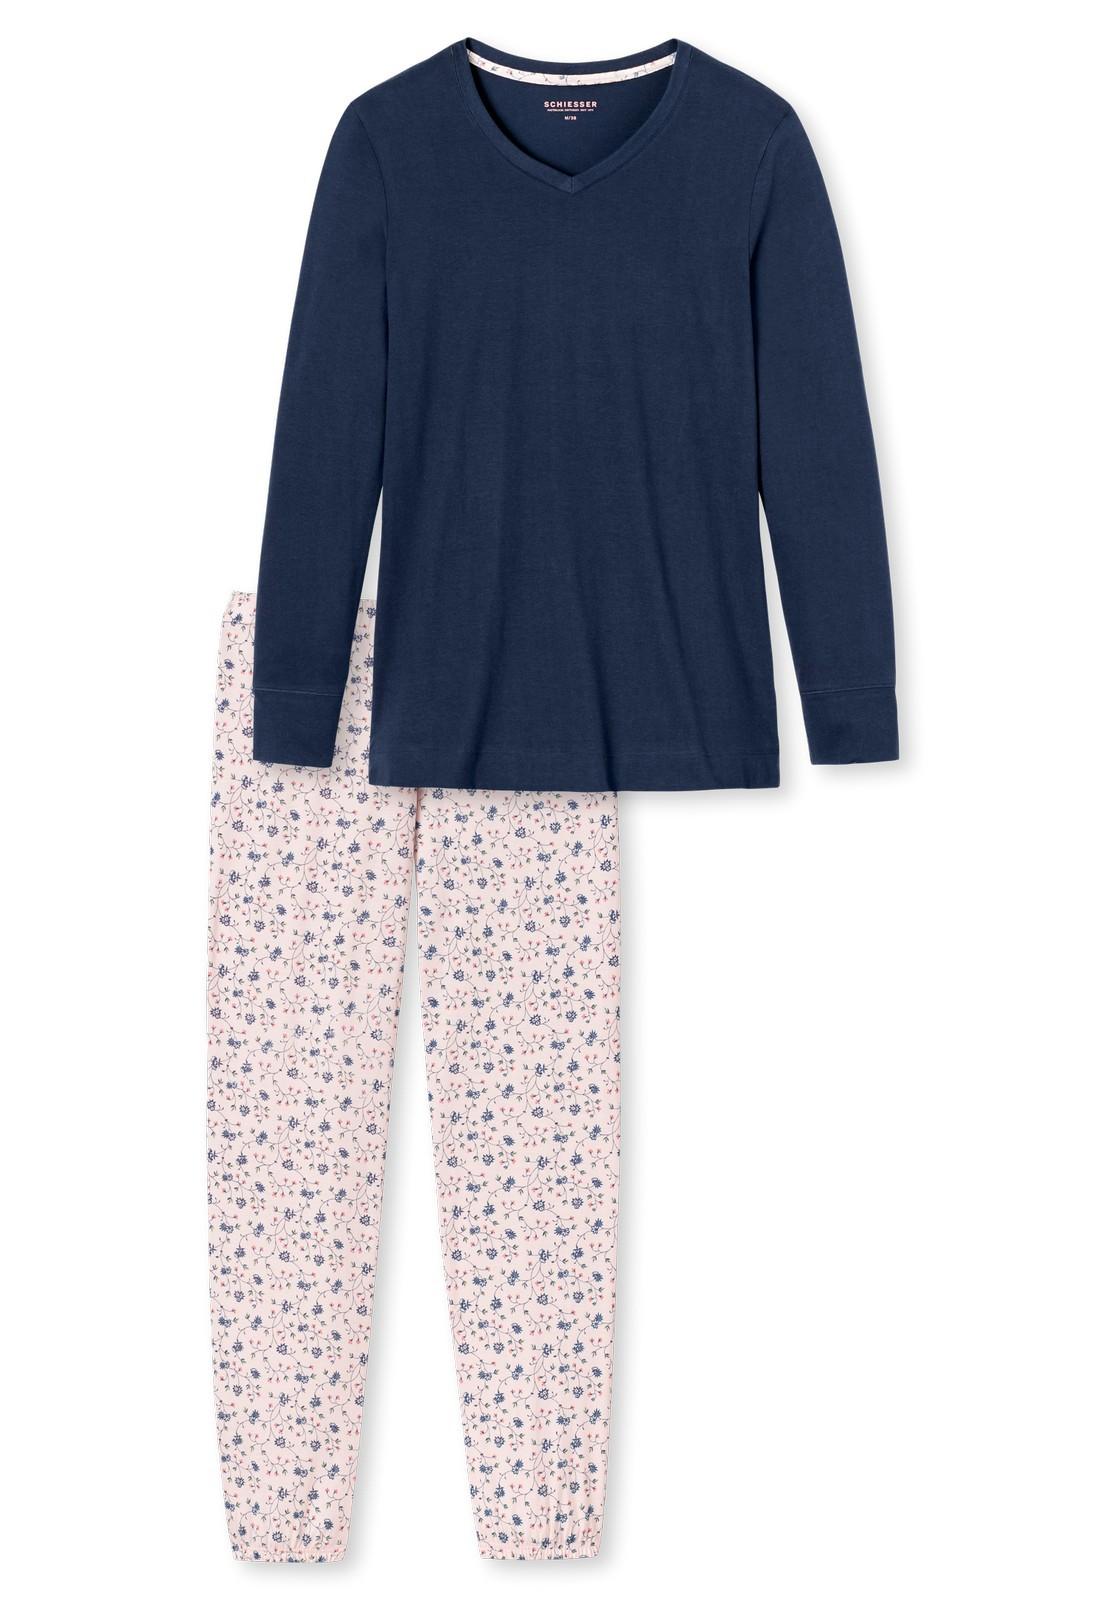 schiesser damen langer schlafanzug pyjama lang 154094. Black Bedroom Furniture Sets. Home Design Ideas